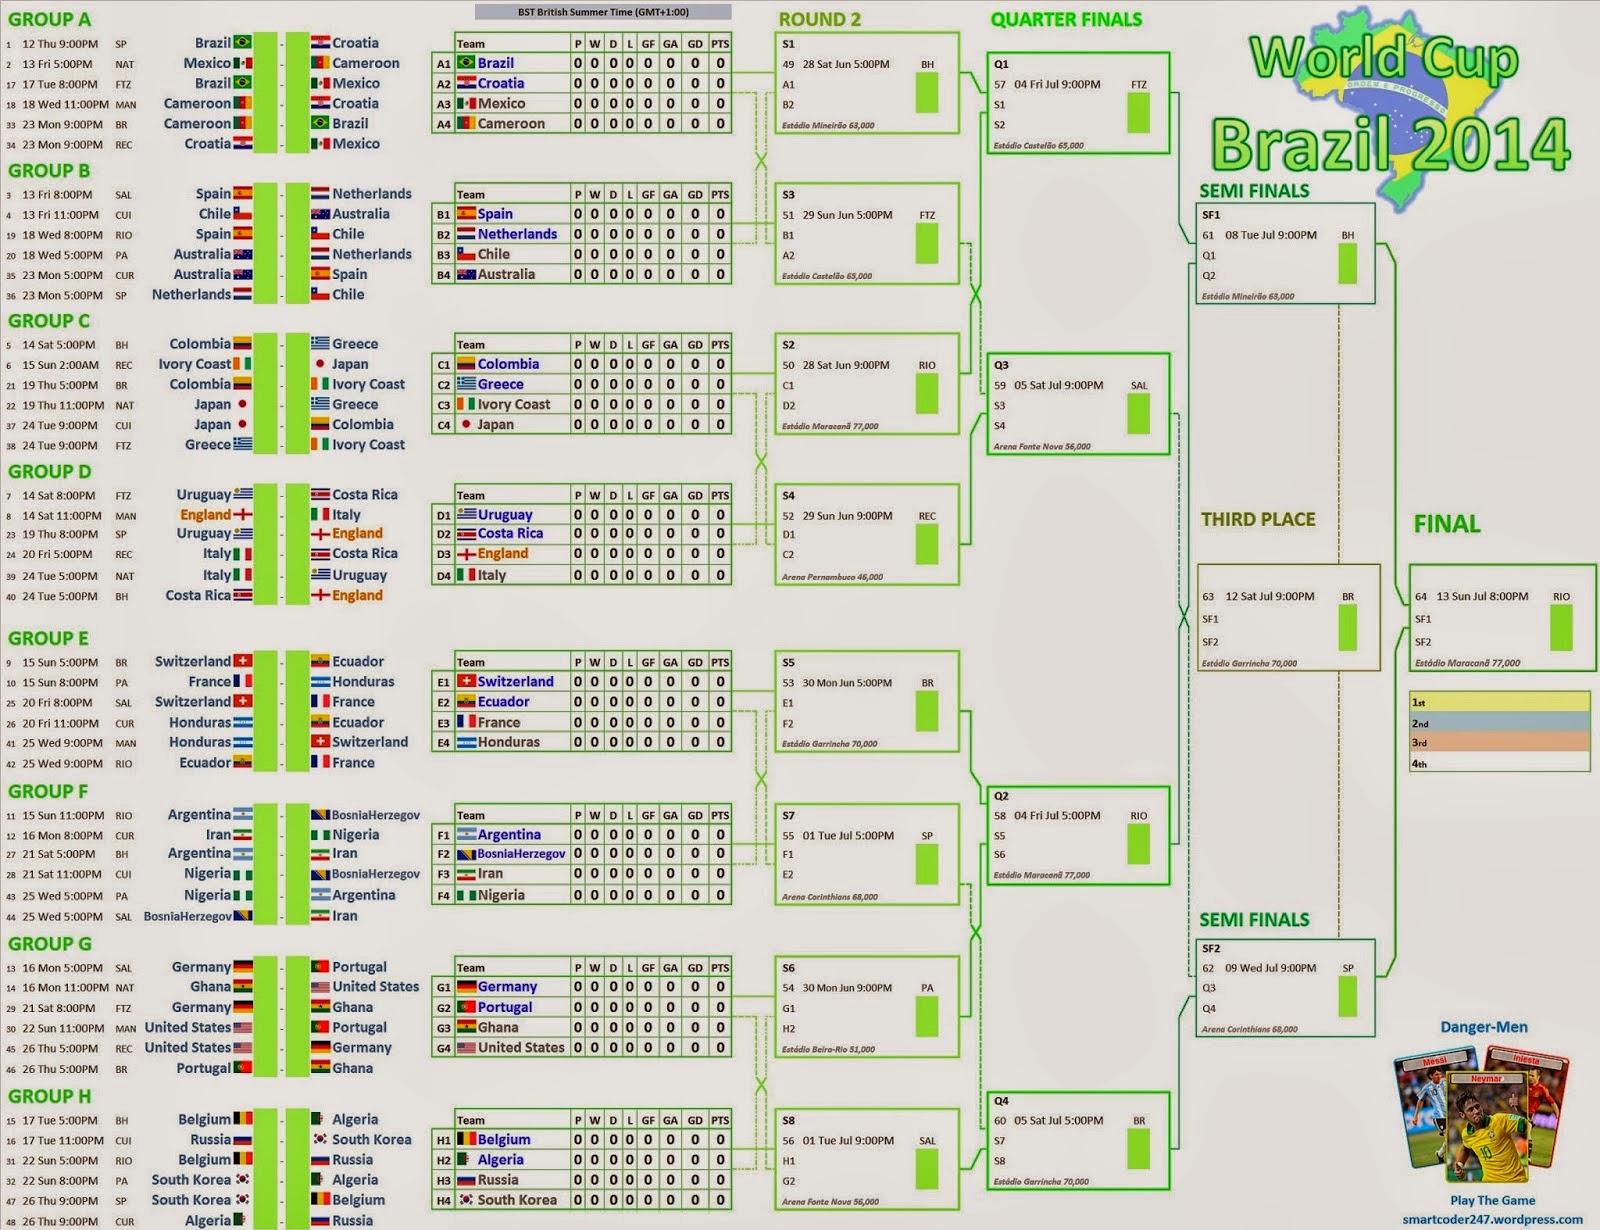 Jadwal Piala Dunia 2014 Brazil Lengkap